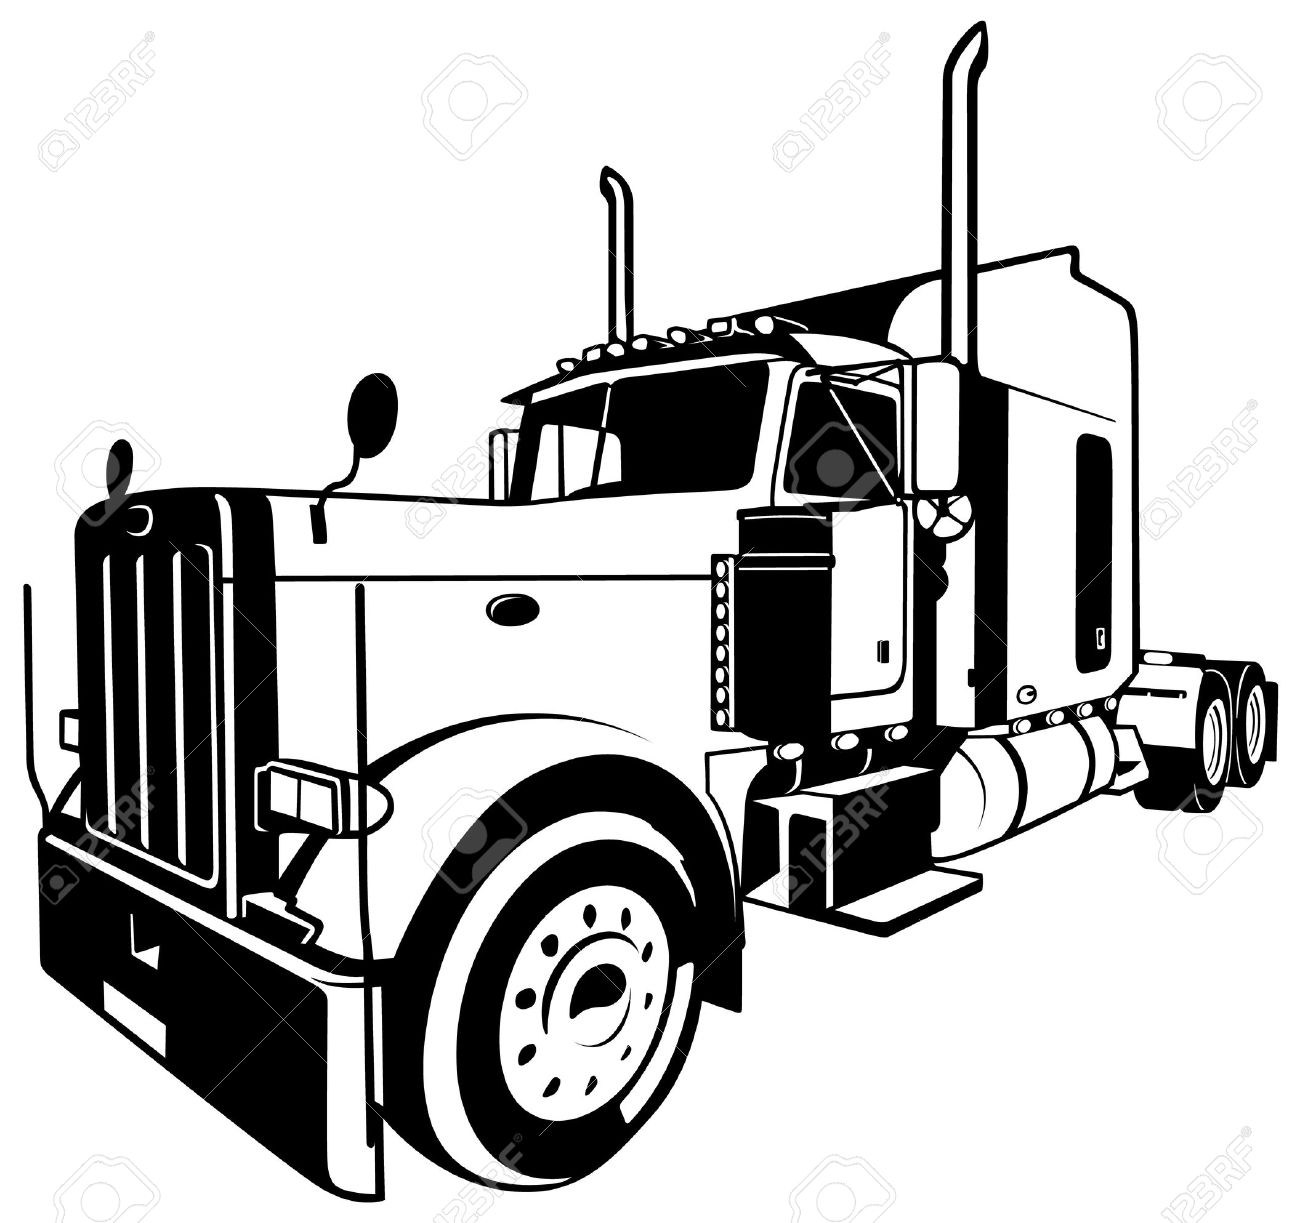 Clipart semi picture black and white library Semi truck vector Elegant Semi Truck Clipart Black And White ? 101 ... picture black and white library